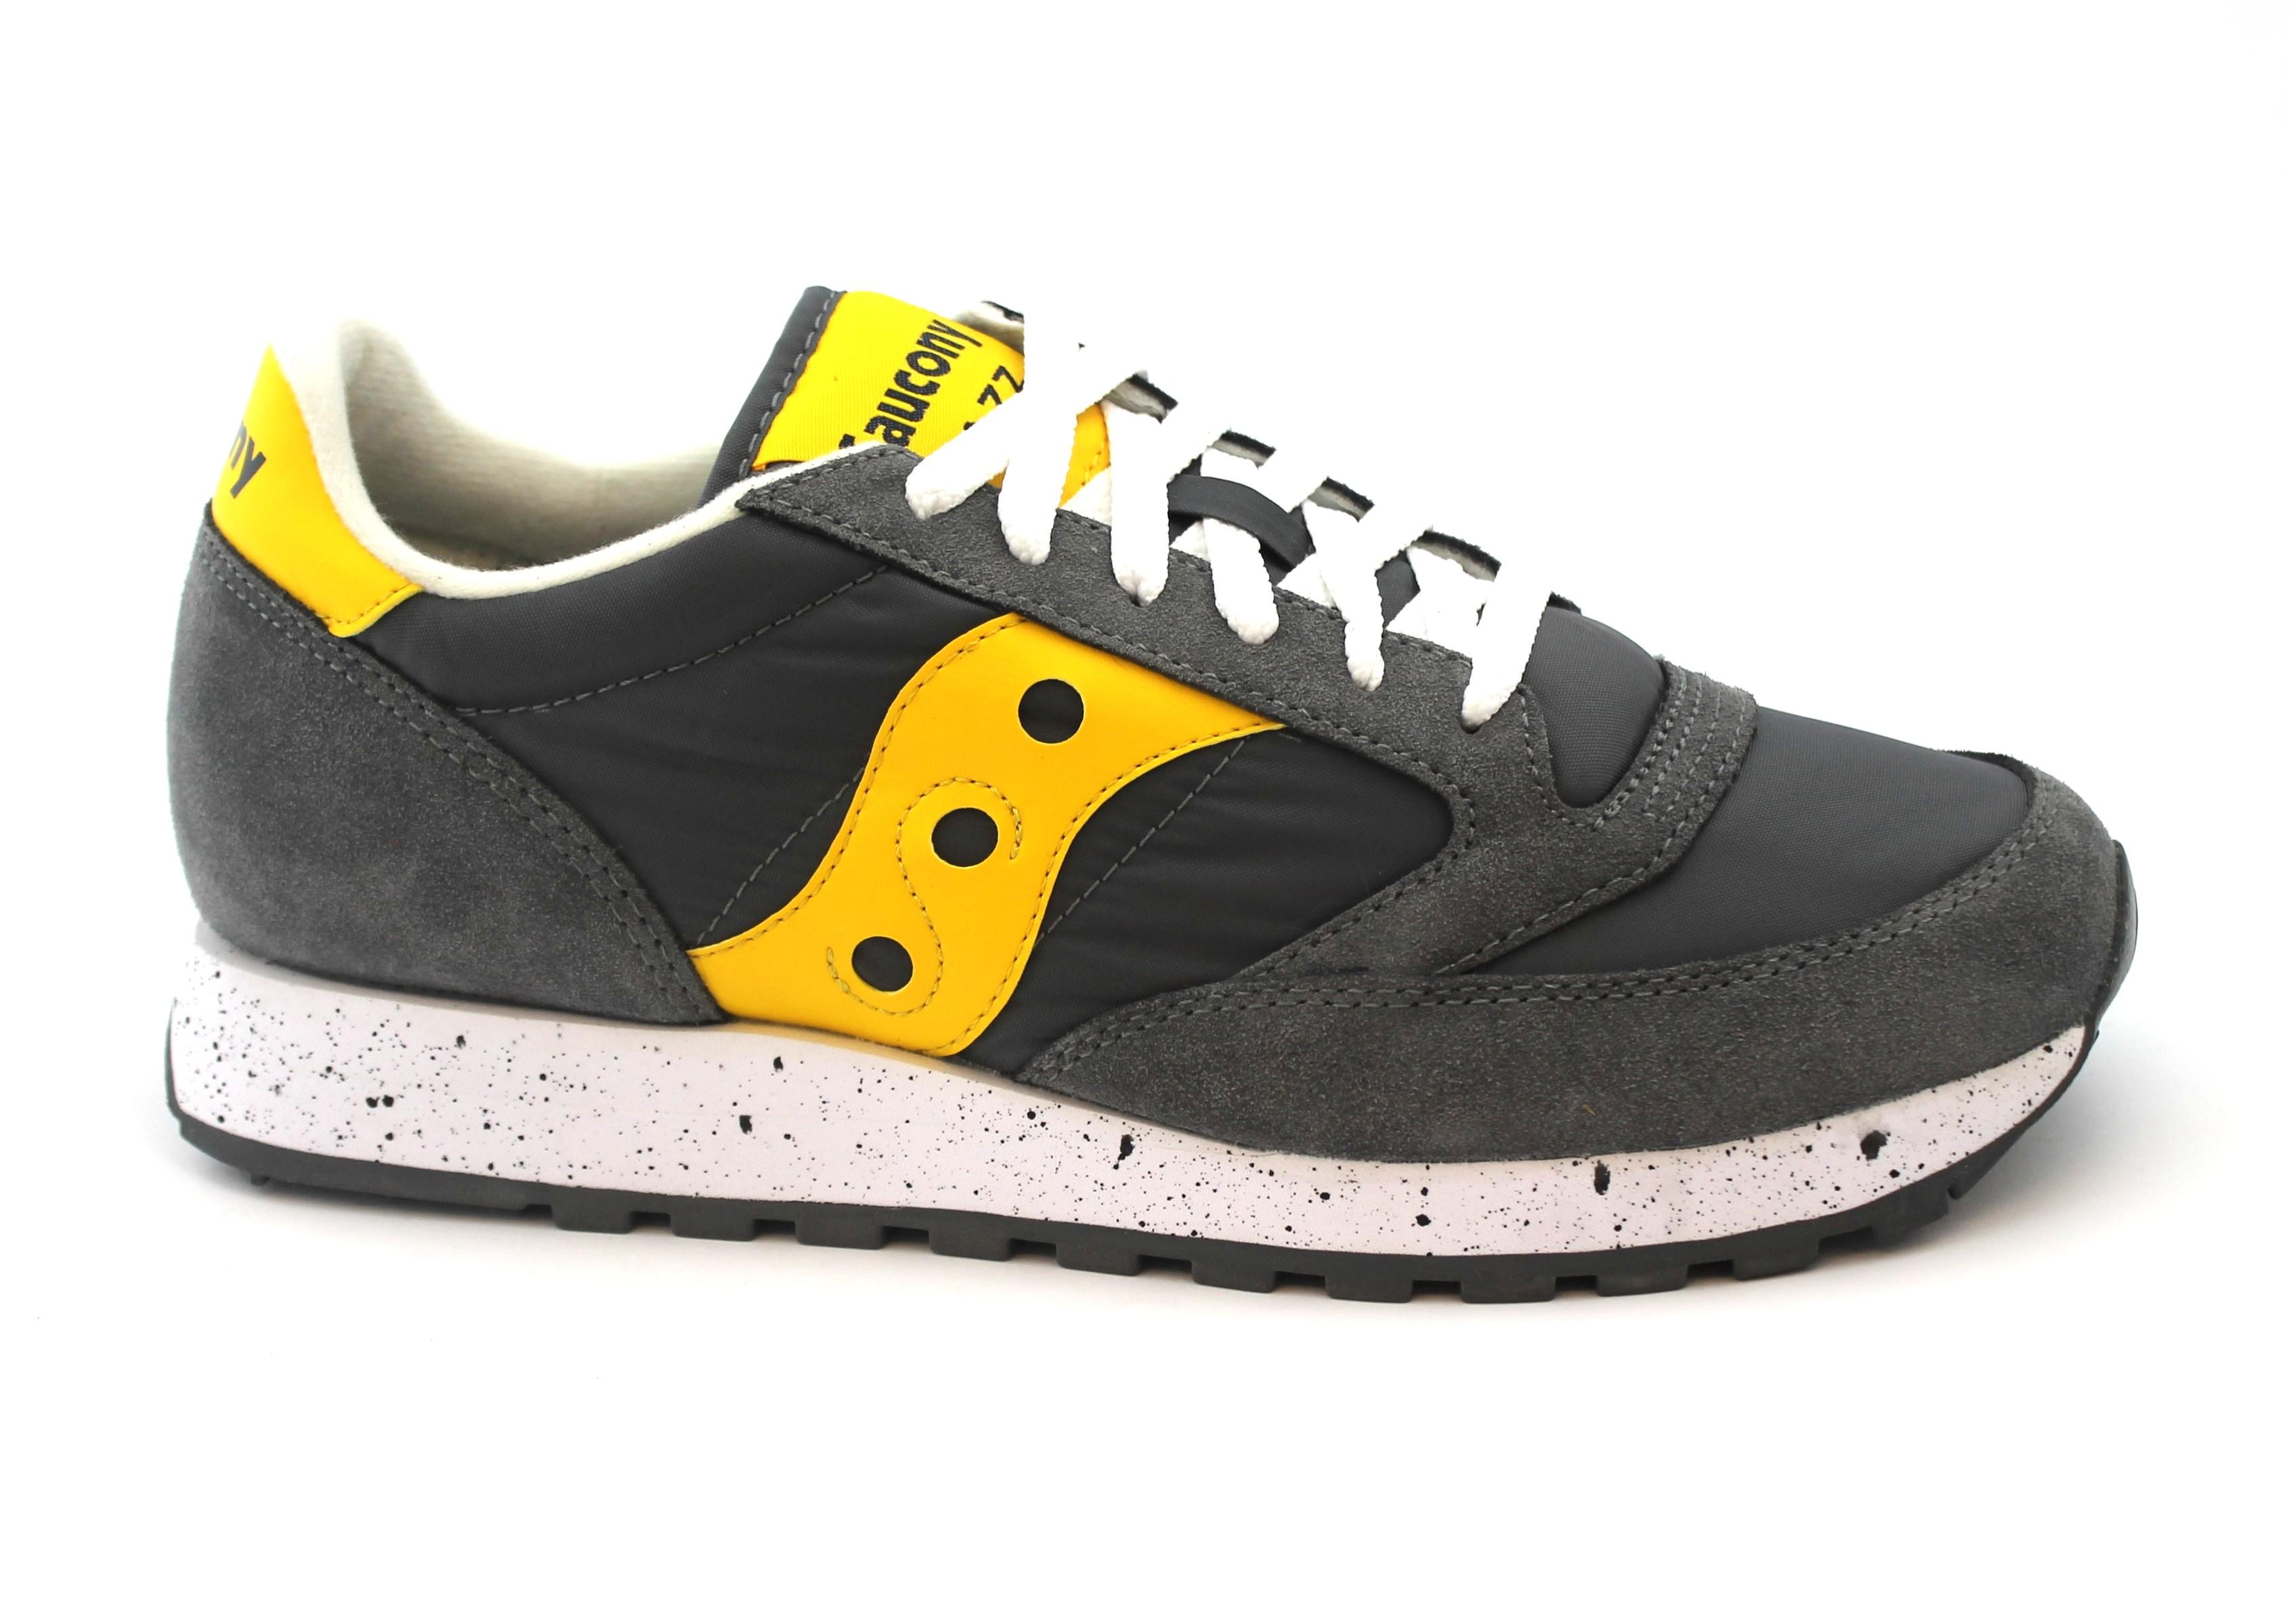 SAUCONY S2044-417 JAZZ ORIGINAL uomo grigio giallo scarpe uomo ORIGINAL sneakers 690c20